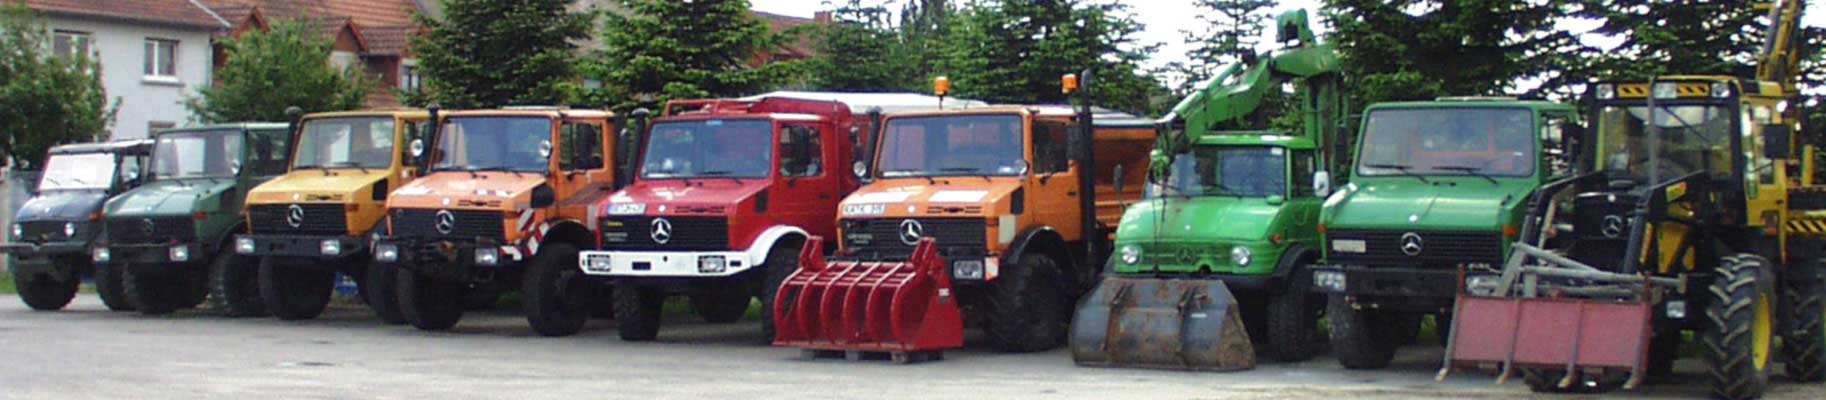 Unimog U406 , Unimog U1000 , Unimog , U1800 , Unimog U1600 , Unimog U1300L , Unimog U1400 , Unimog U406 , Unimog U1000 , MB-trac 900 turbo